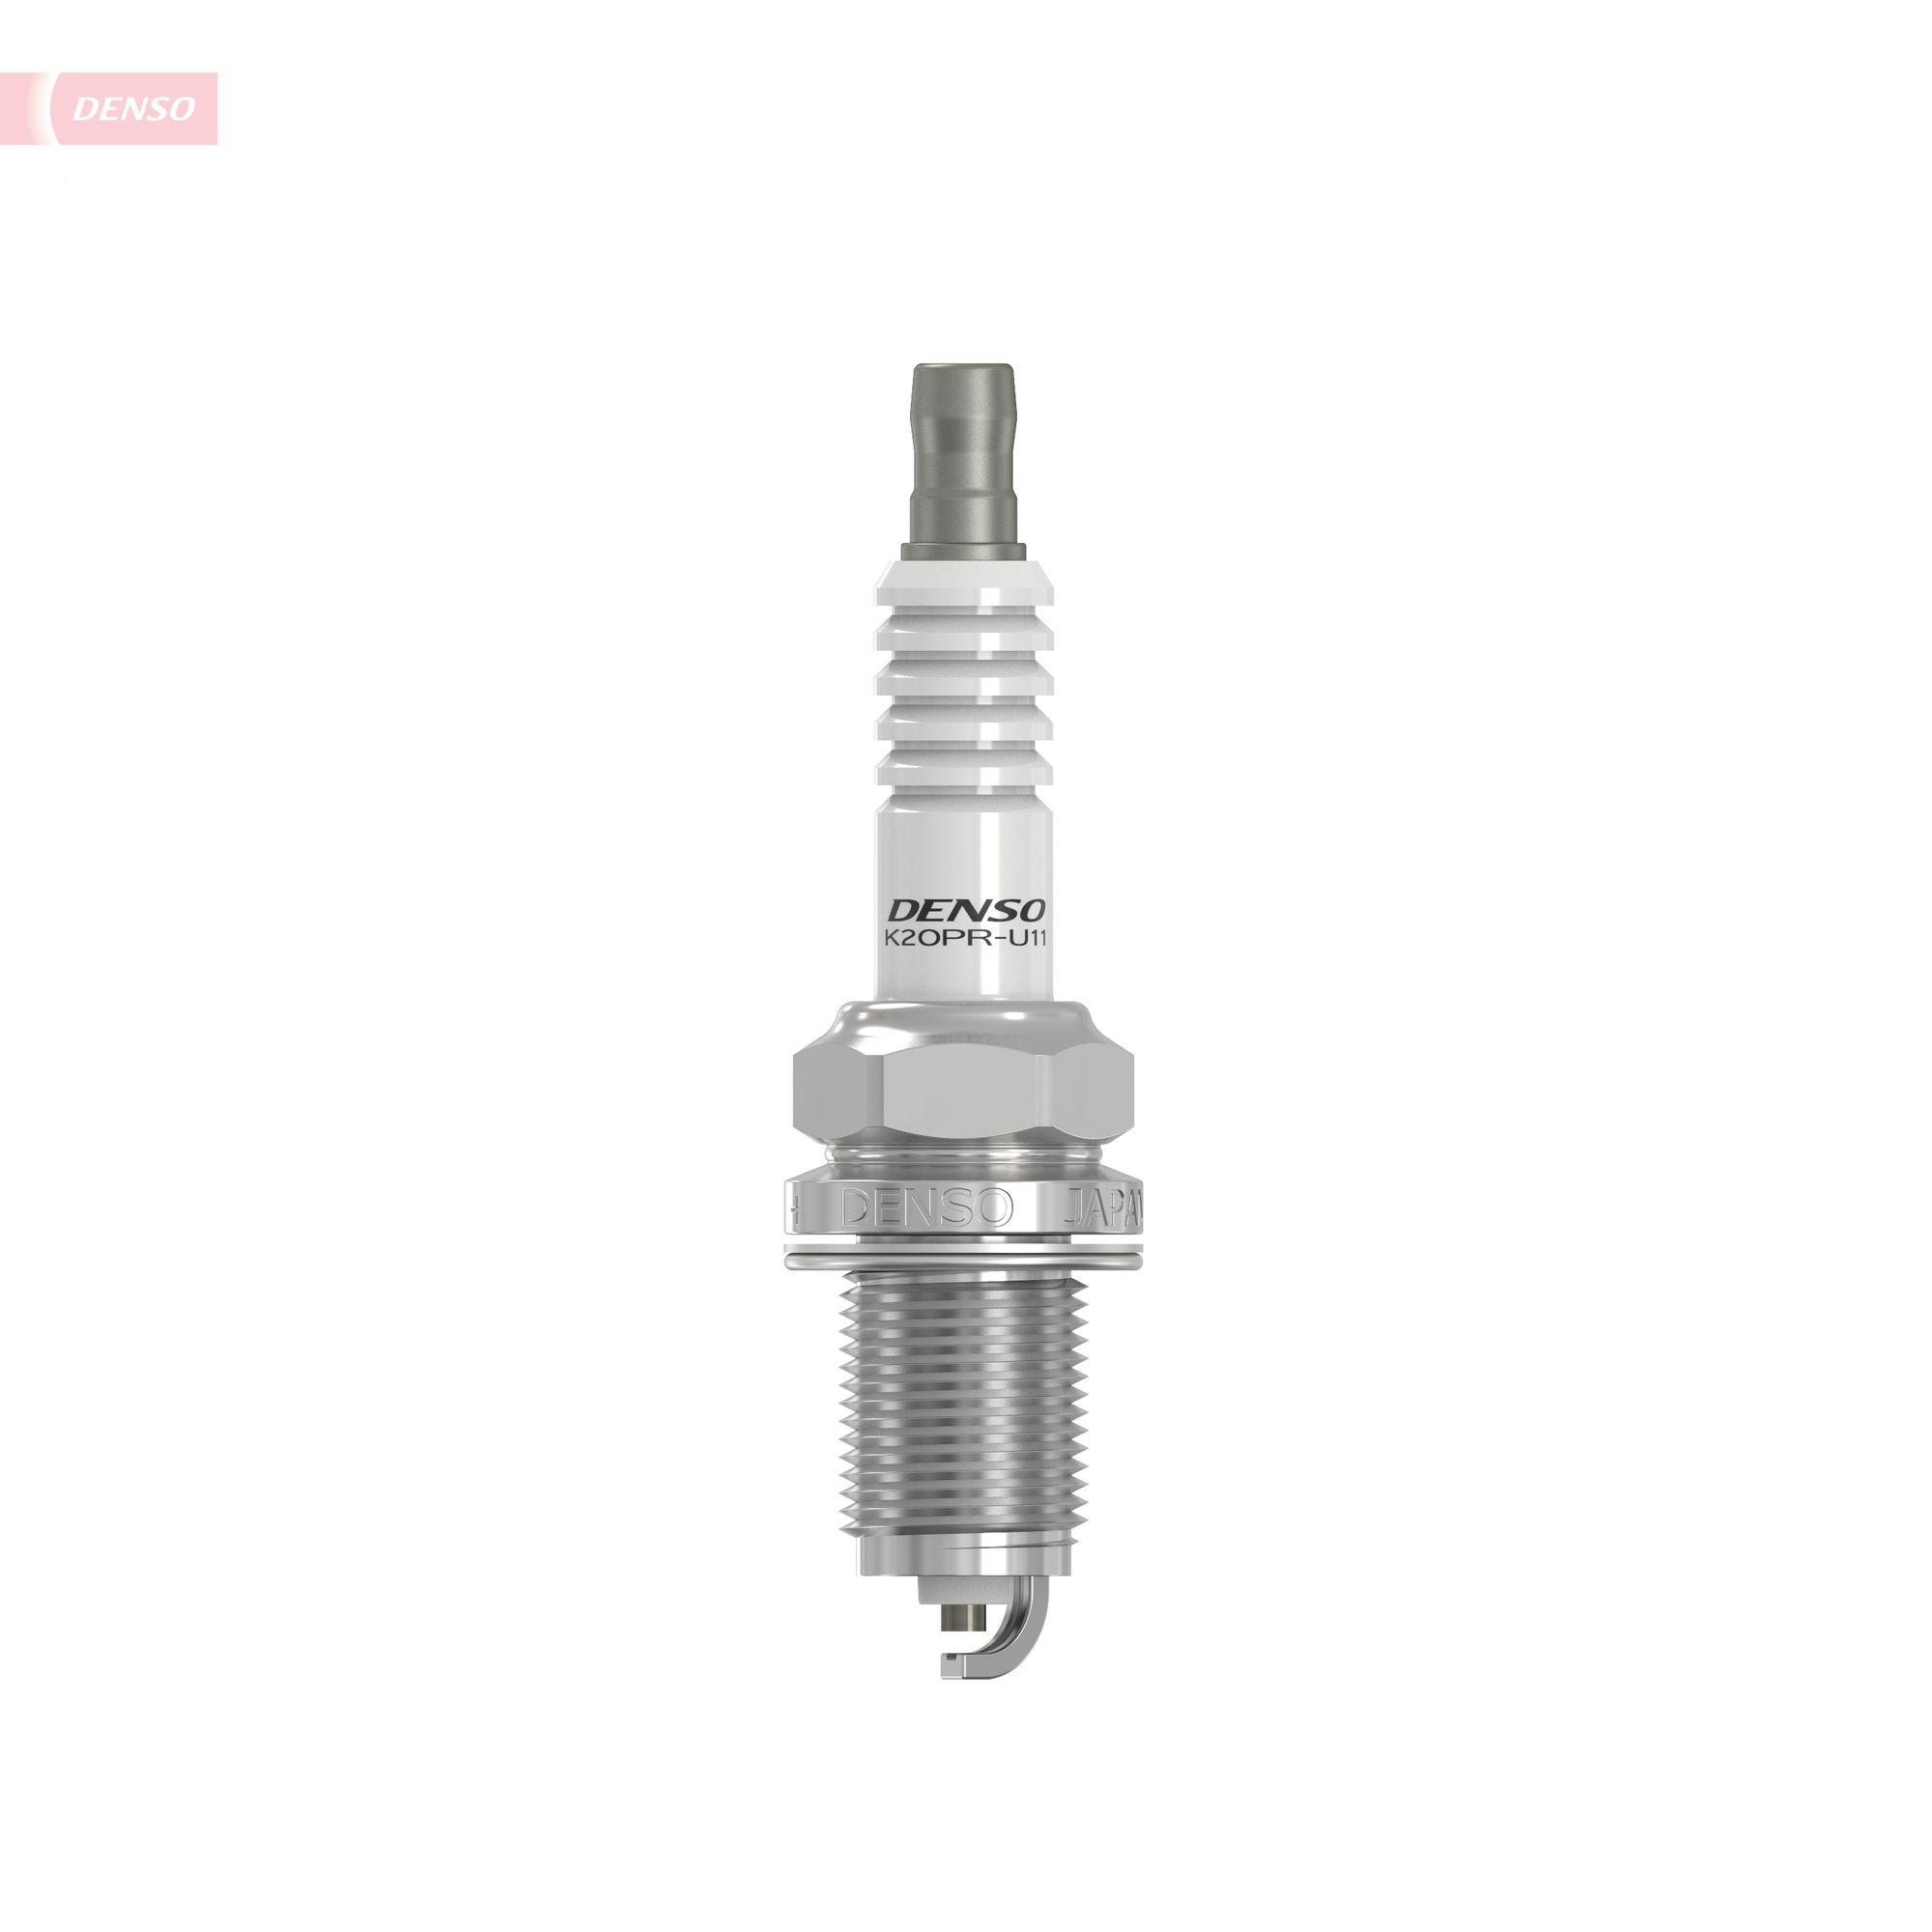 K20PR-U11 Zündkerze DENSO in Original Qualität